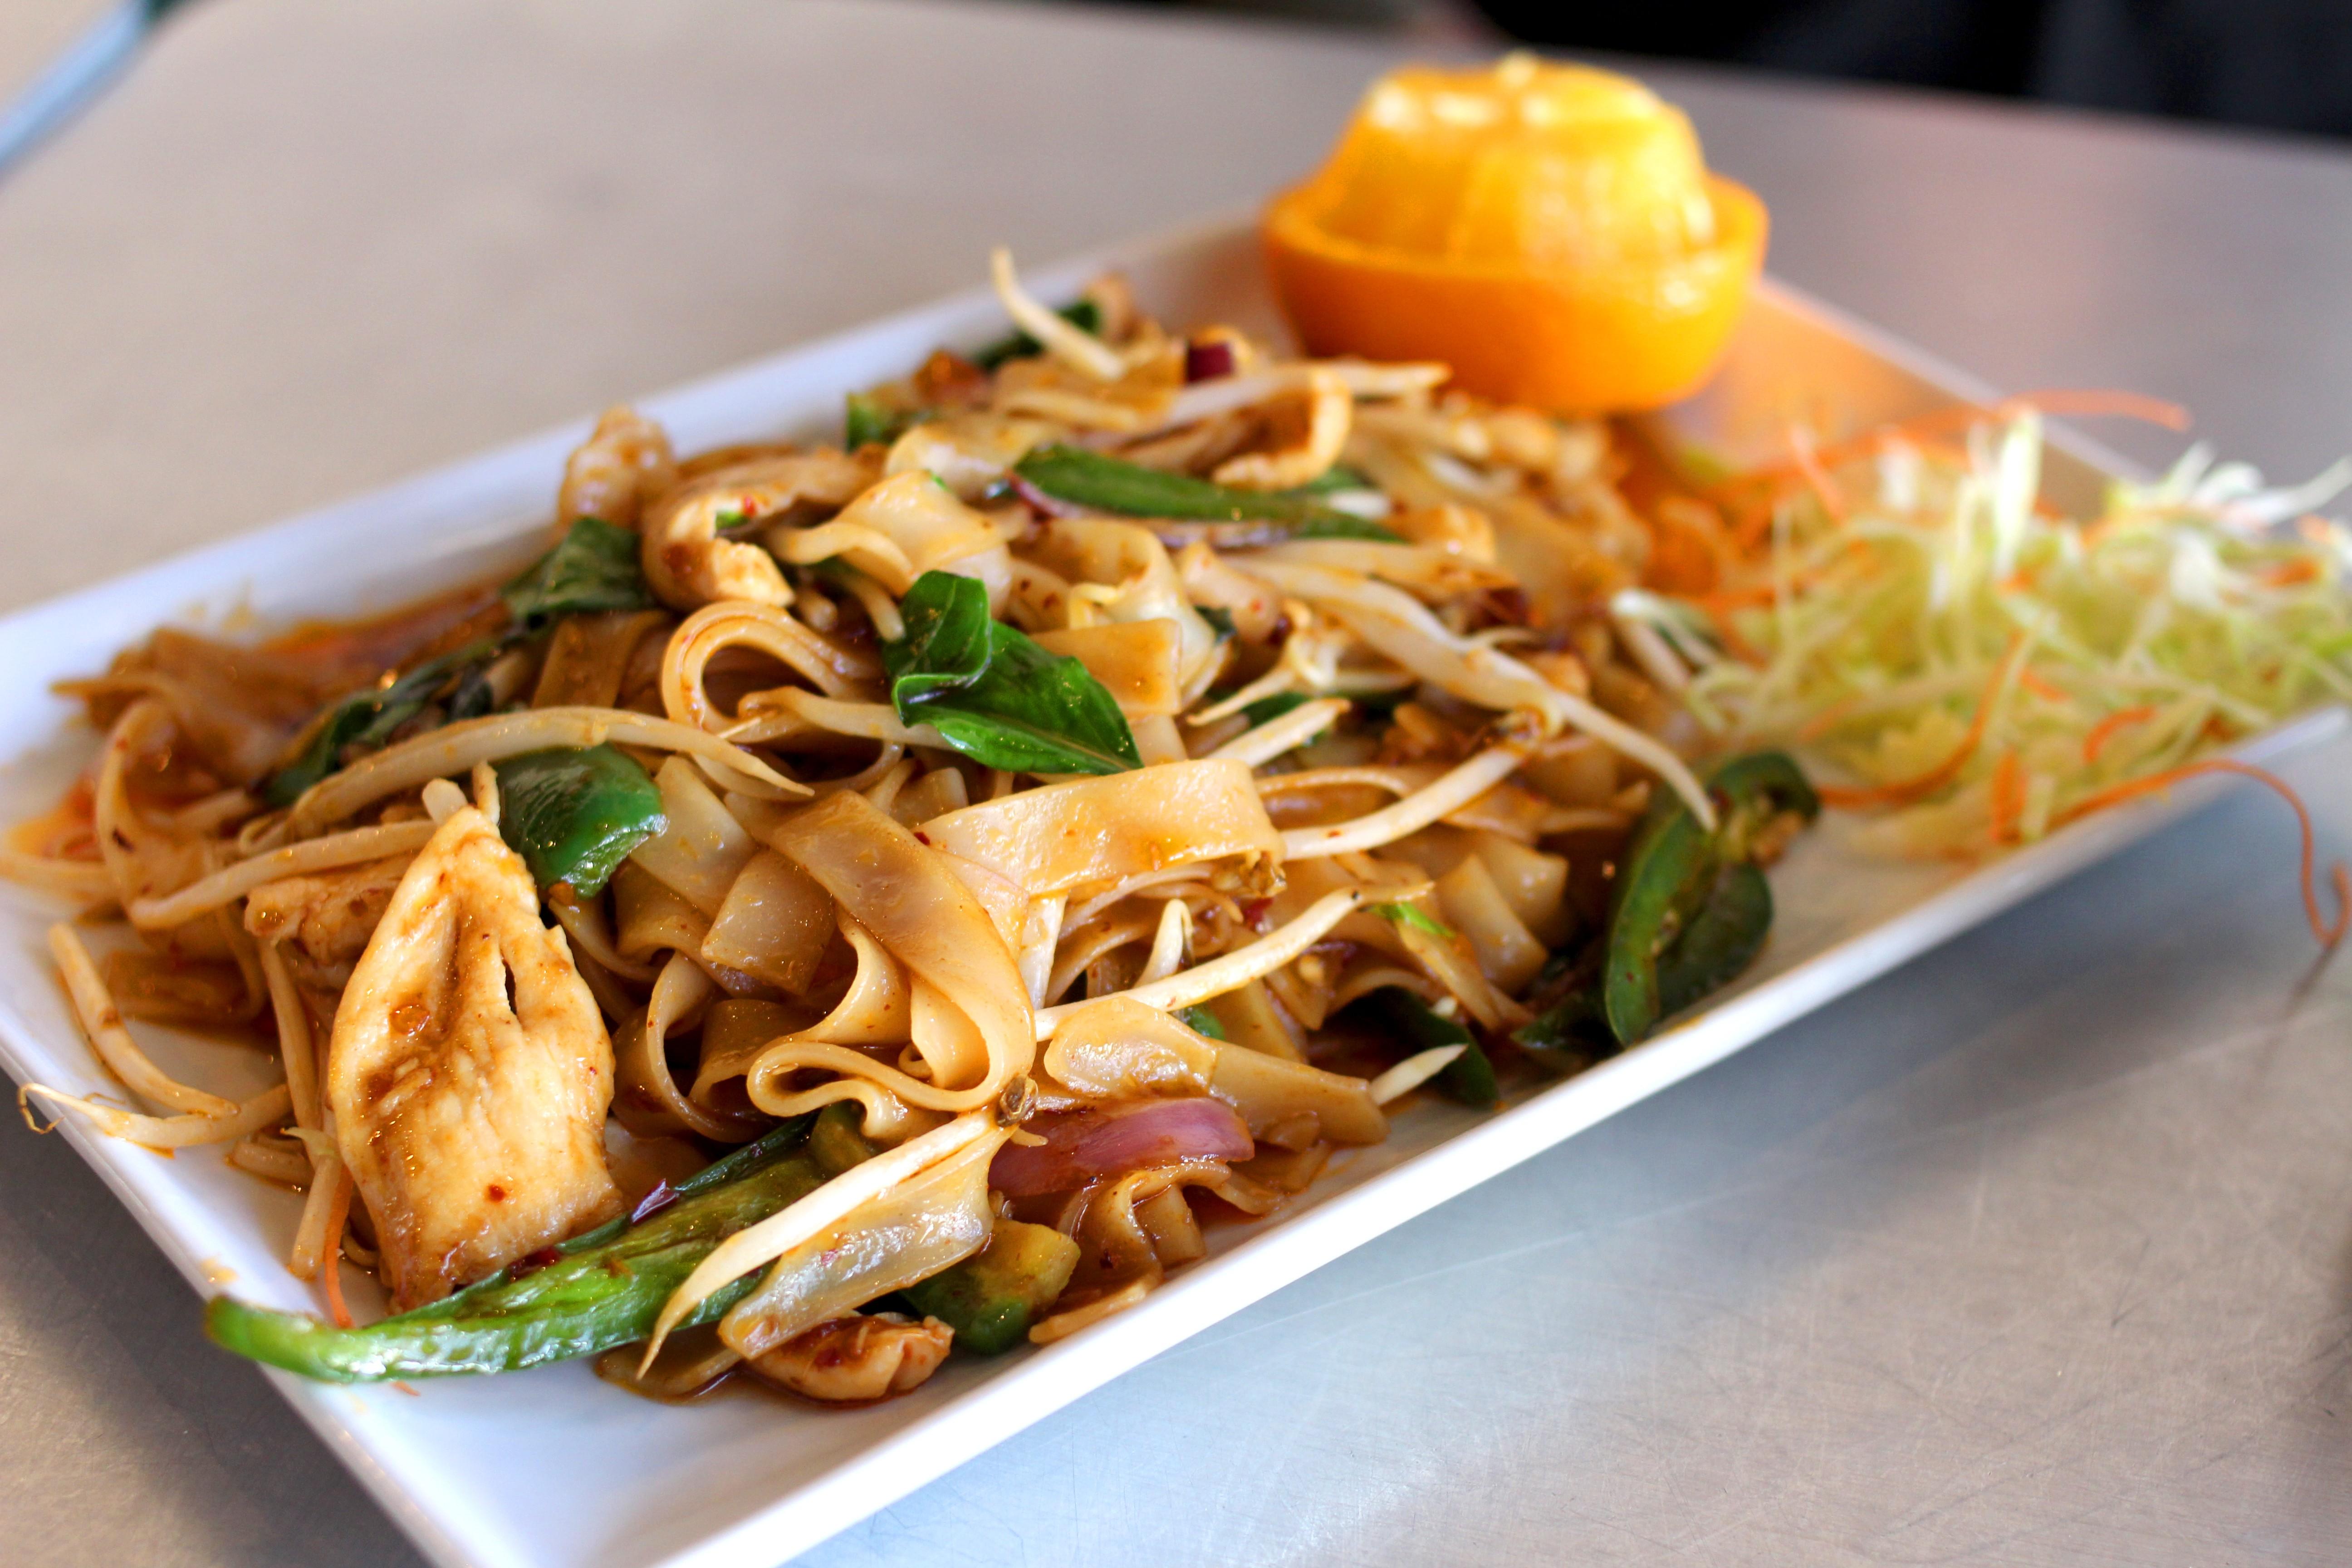 Liebenswert Mein Bad Beste Wahl 4 Seasons Restaurant Offers Thai, Chinese And